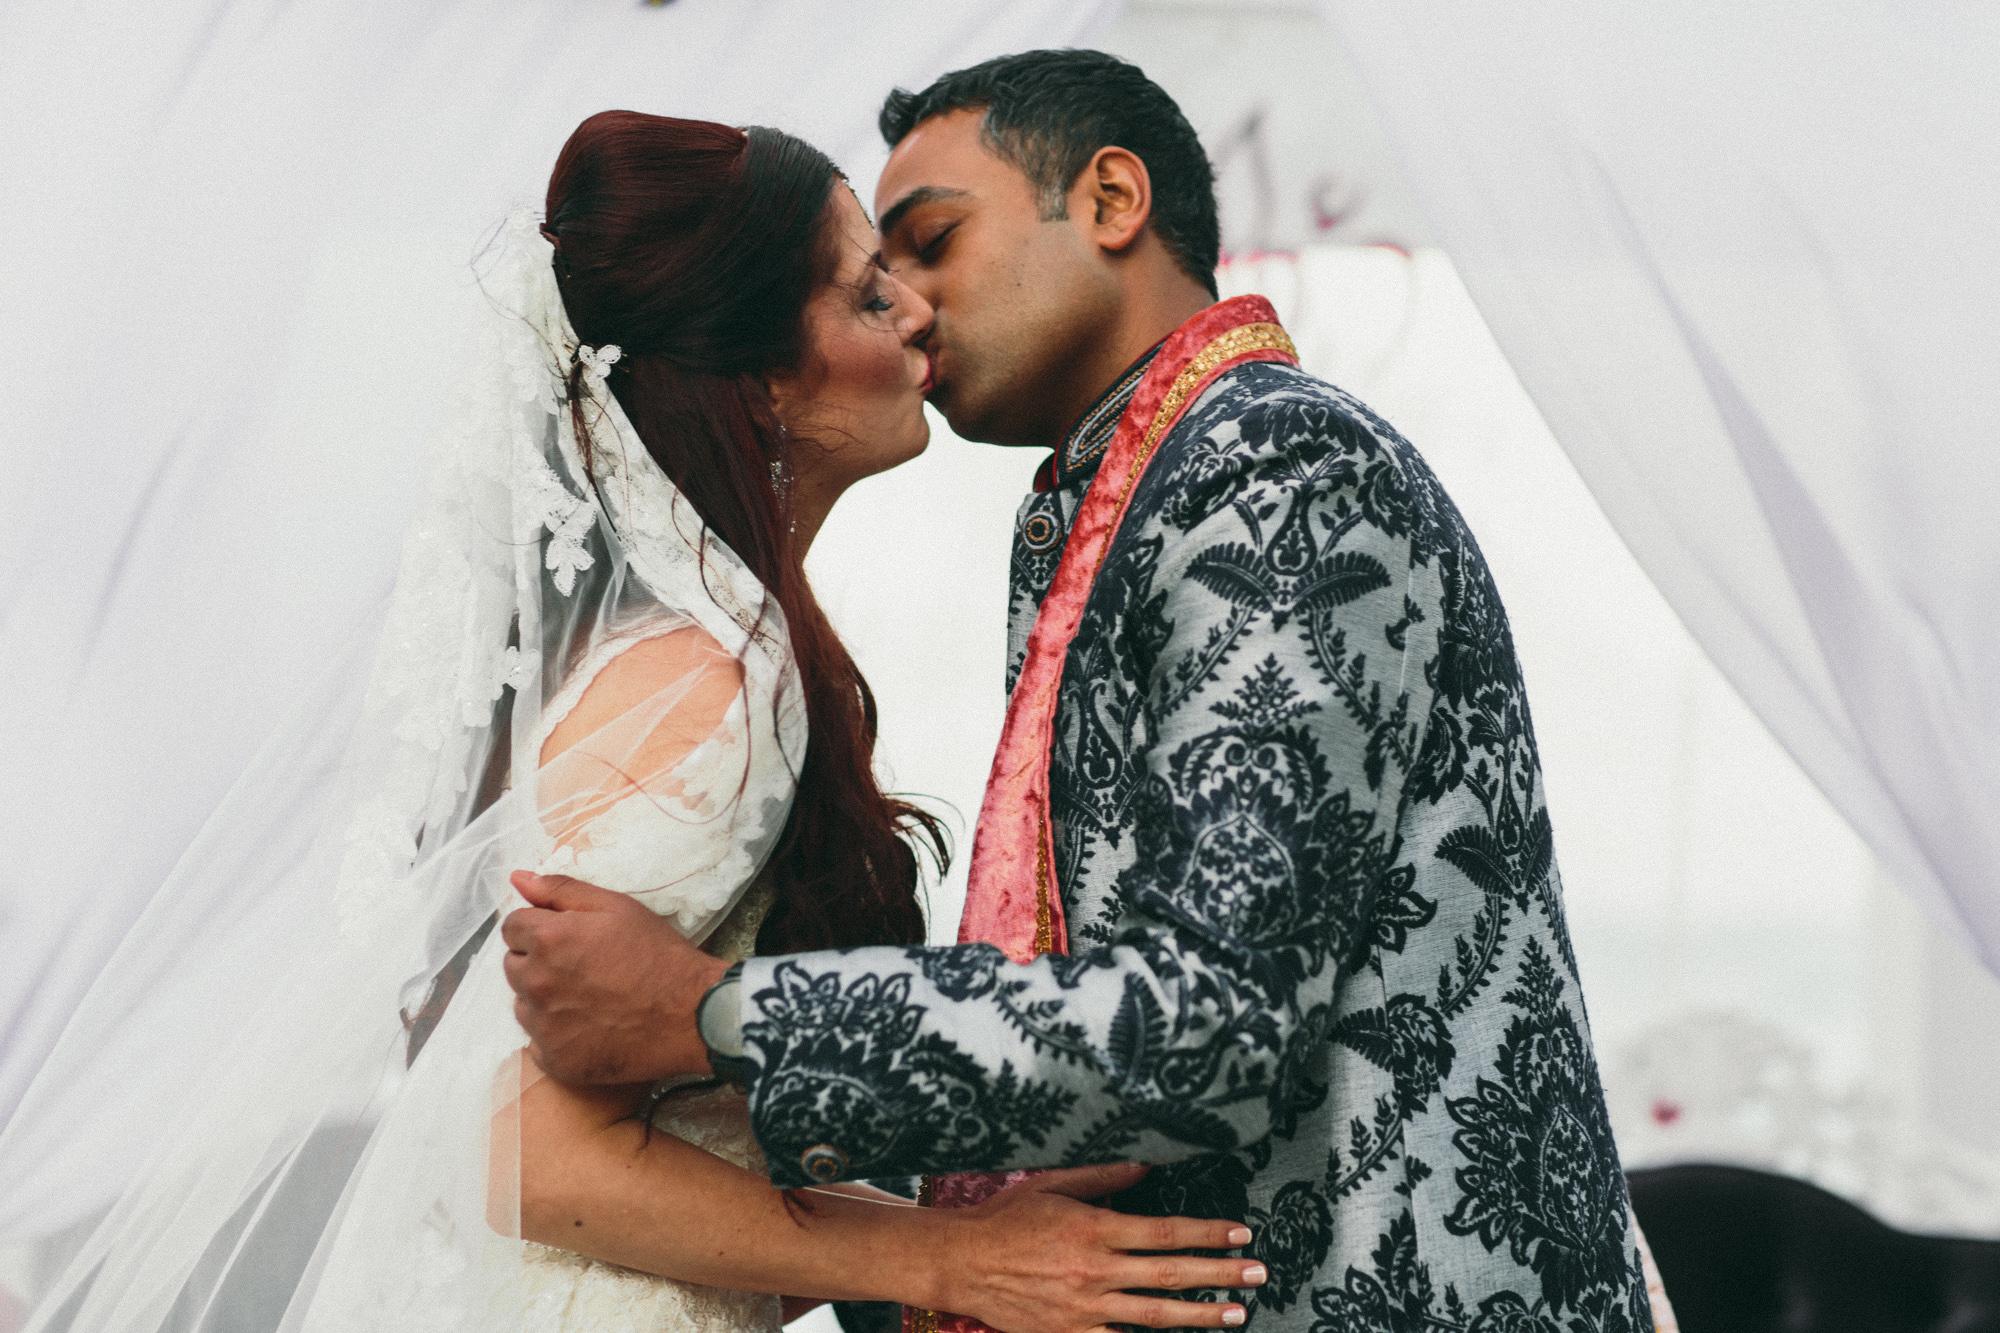 Puerto Rico Wedding Photography Destination Photographer Boris Zaretsky San Juan PR Casino Antiguo La Concha _B2C7295.jpg